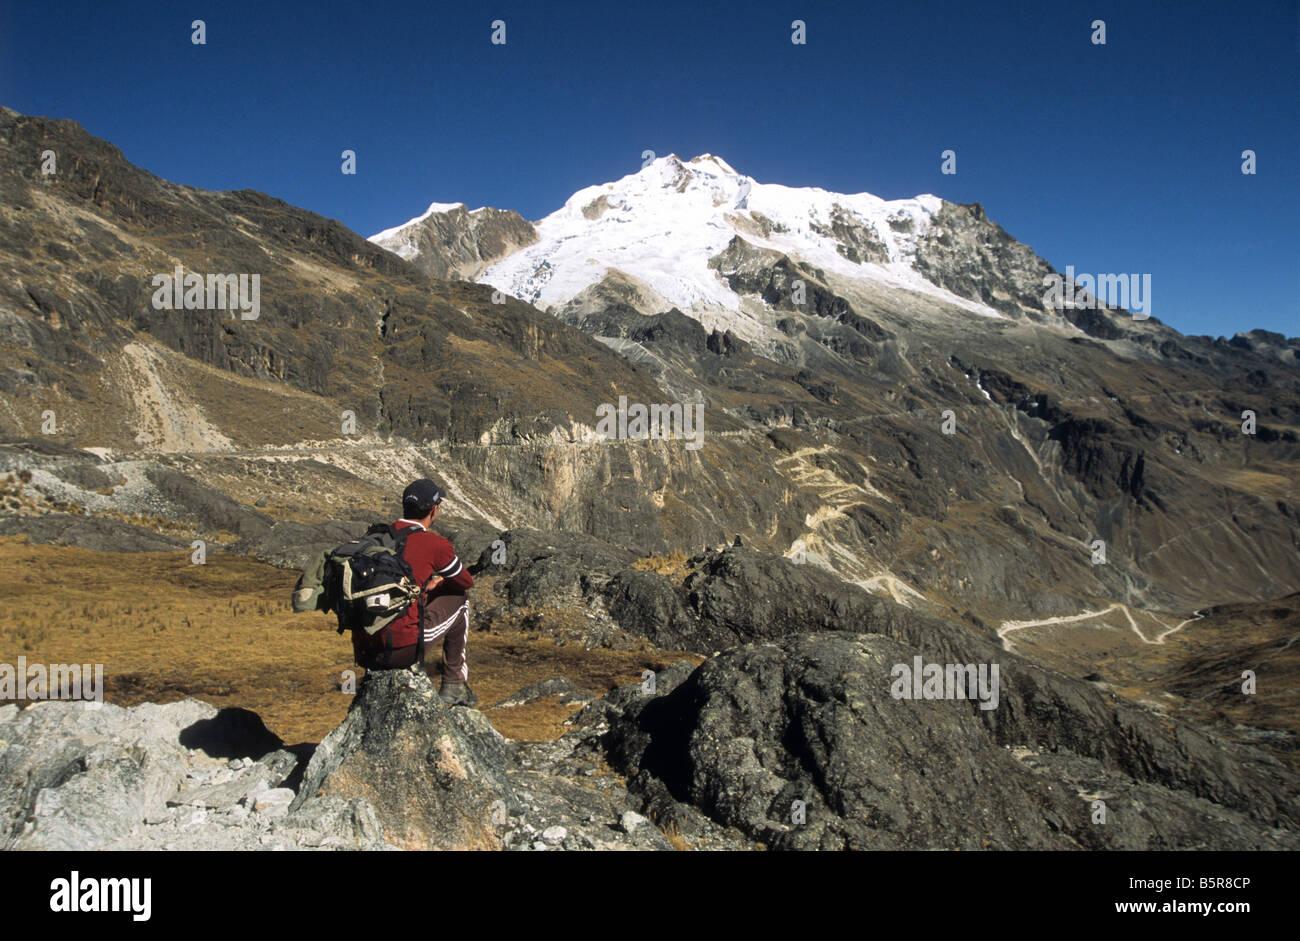 Male trekker looking at view near Mt Huayna Potosi, Cordillera Real, Bolivia - Stock Image